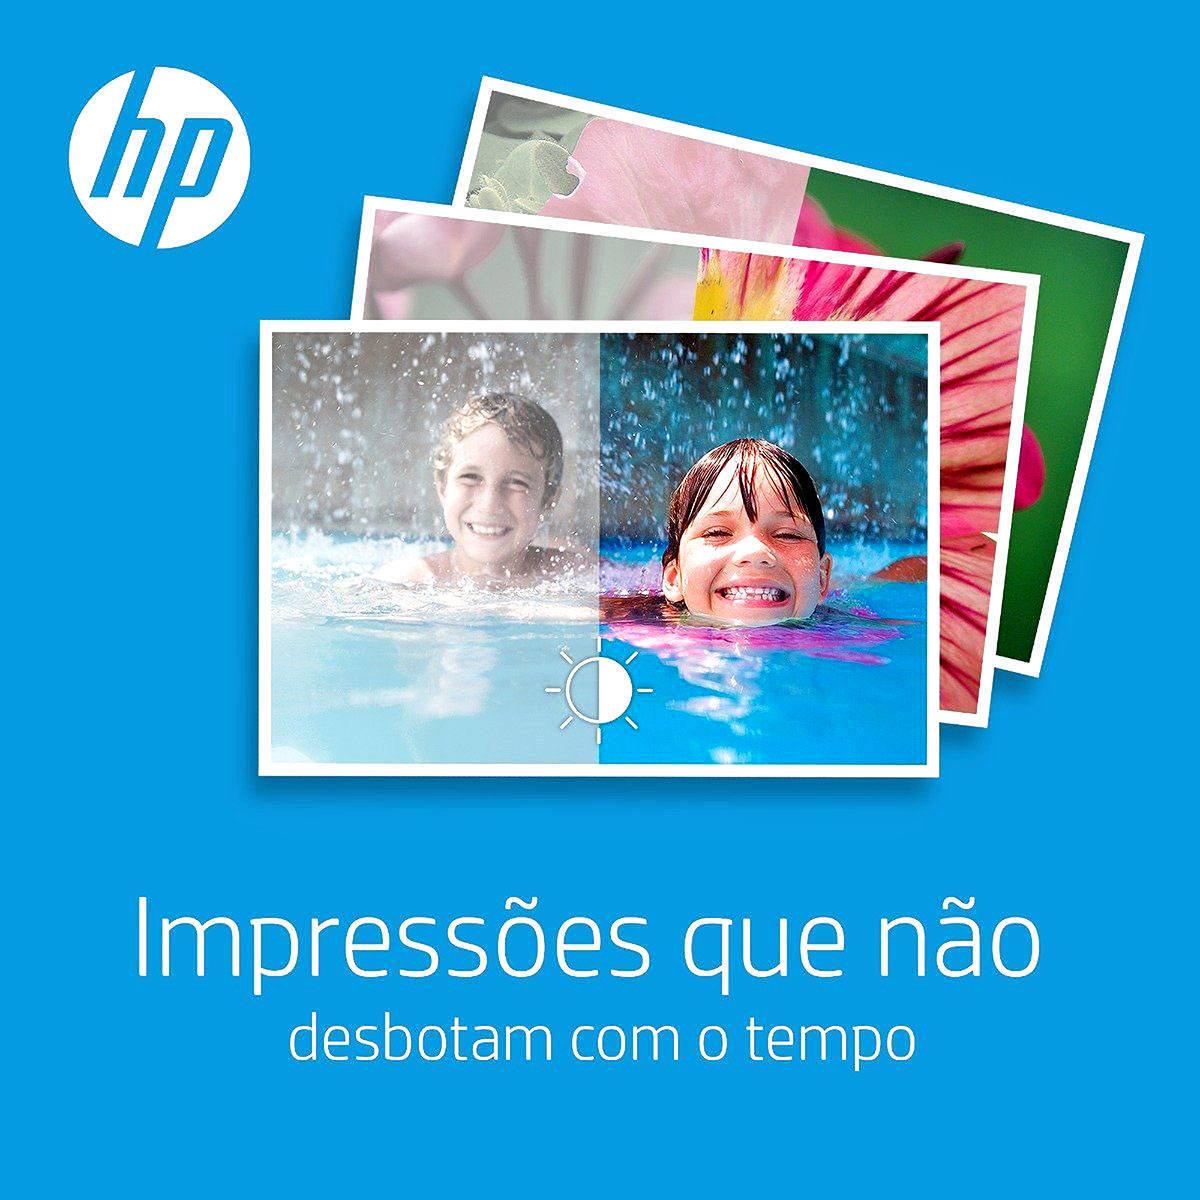 Kit Cartucho de Tinta HP 662 Preto + 662 Colorido para HP DeskJet 1510 2516 3546 2546 1516 4646 2646 1016 1515 Original